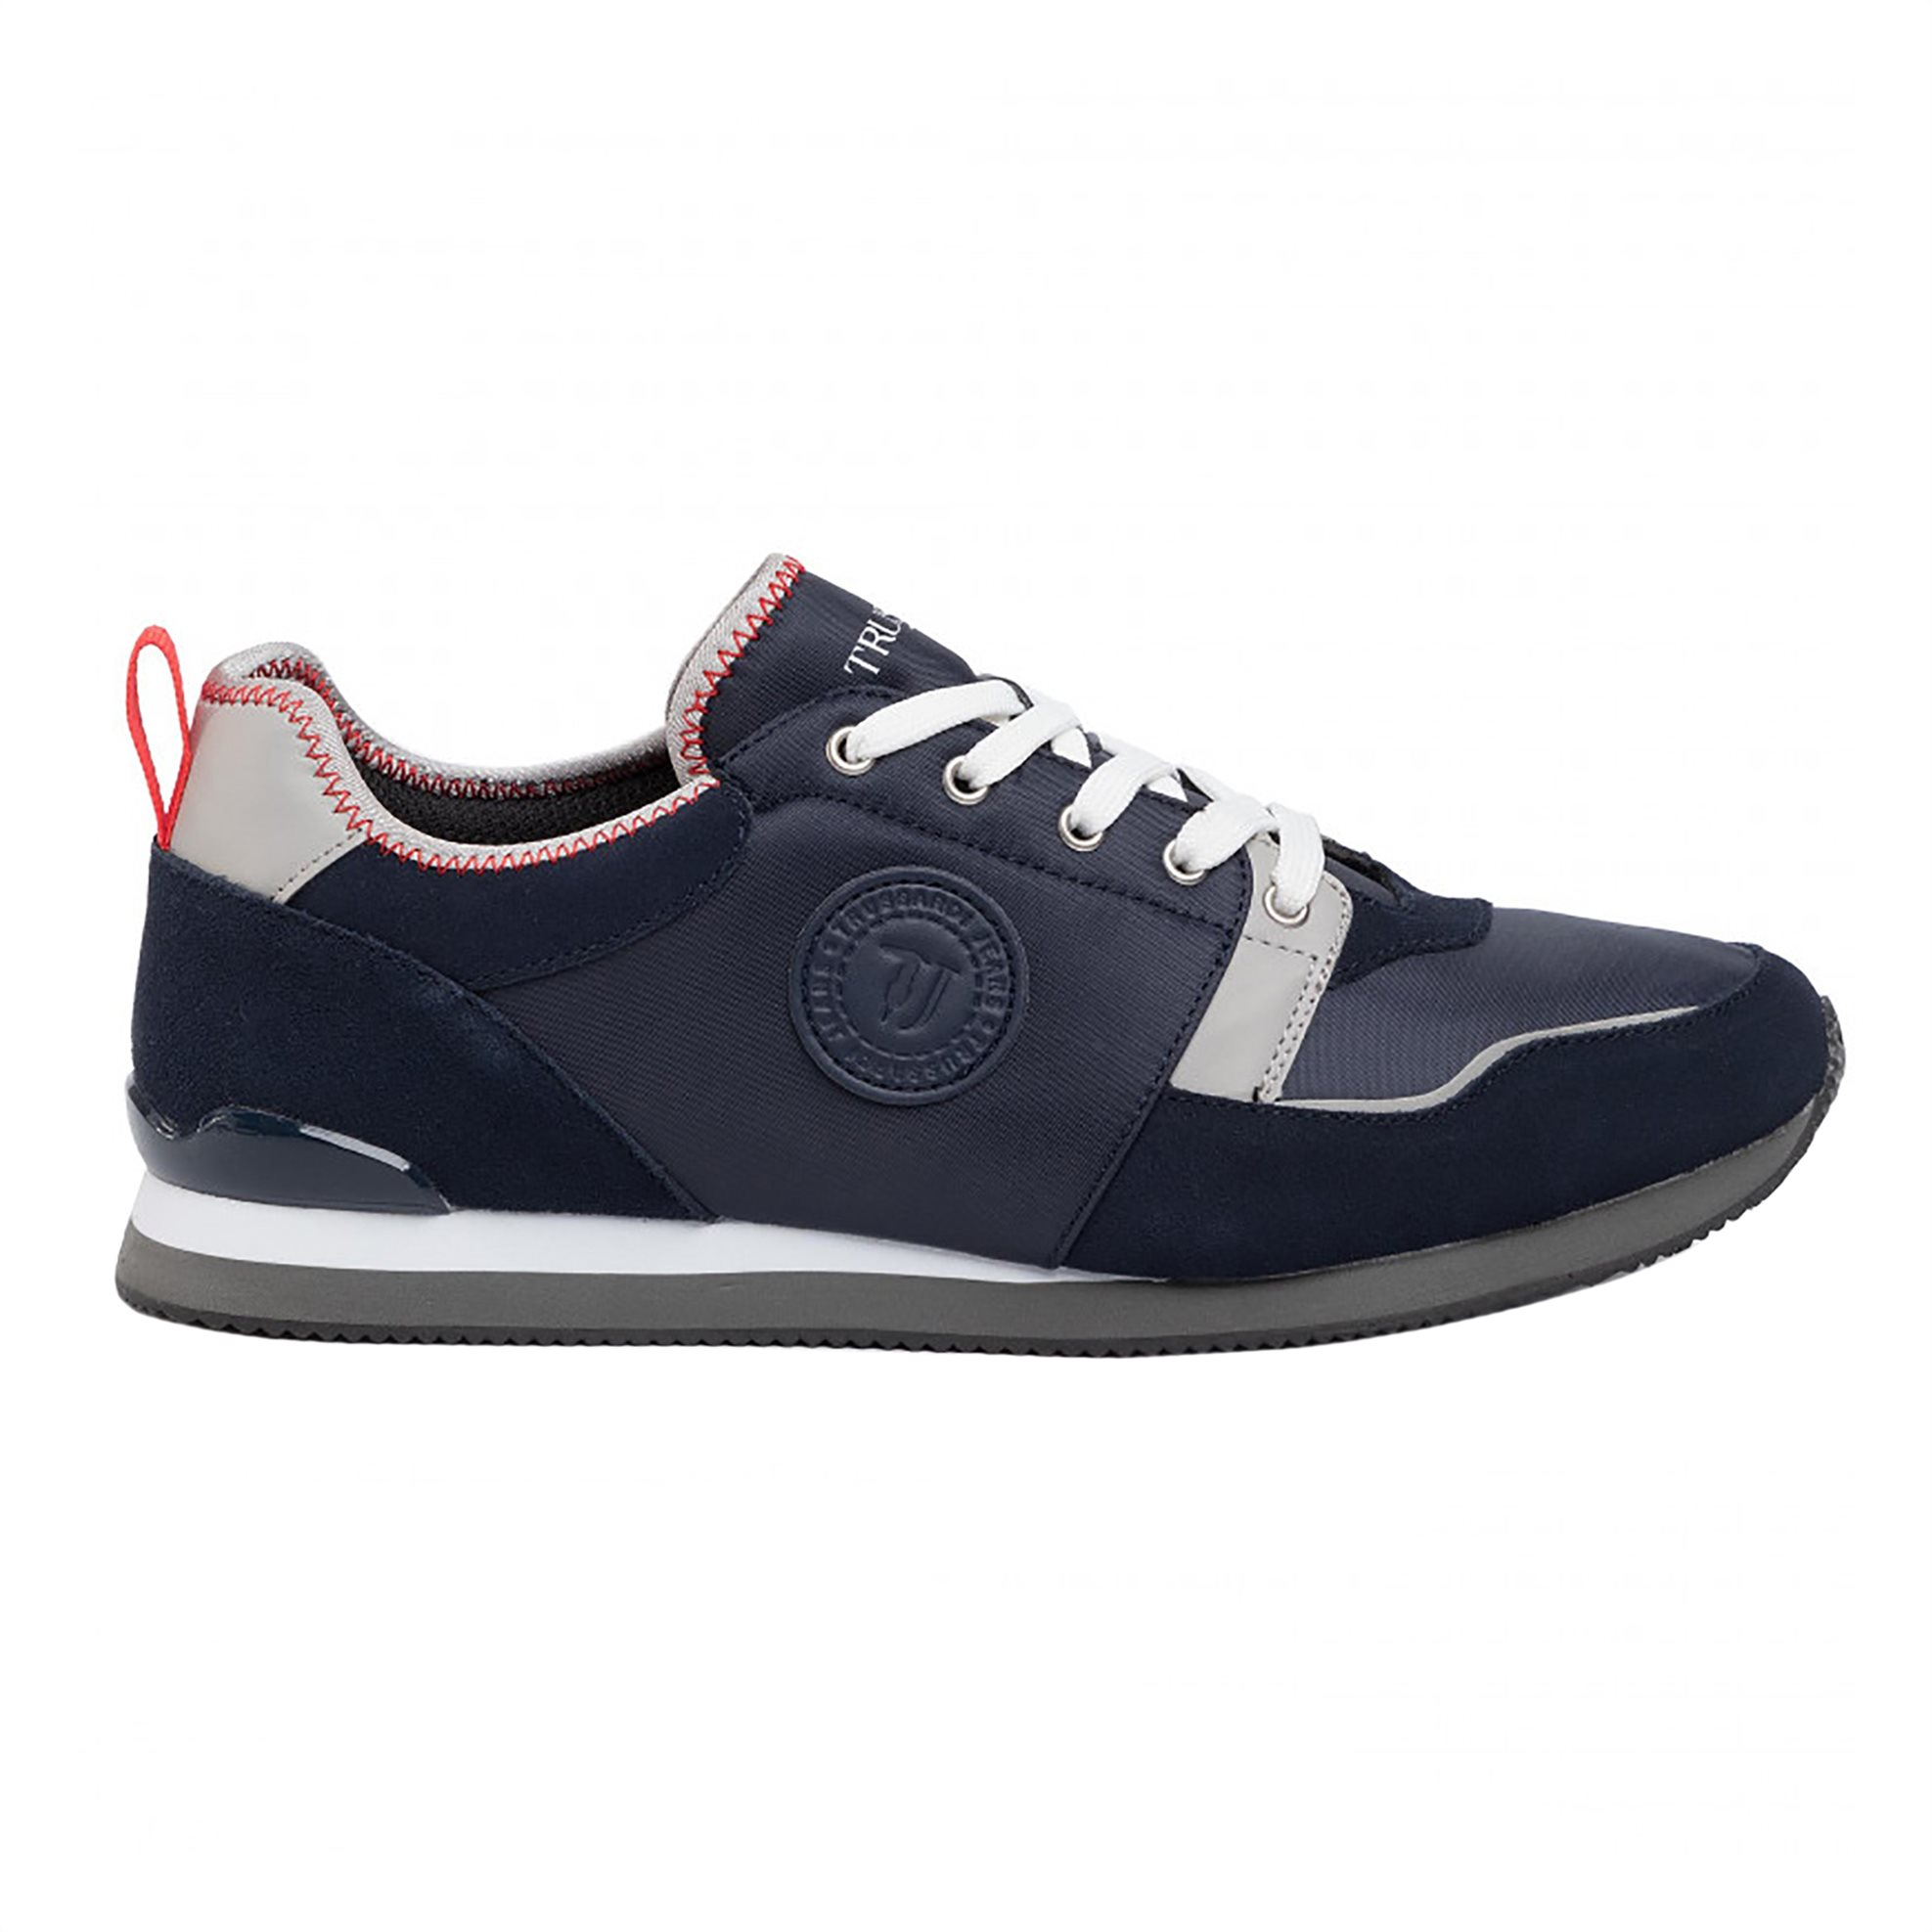 Trussardi Jeans ανδρικά sneakers με suede λεπτομέρειες – 77A00245-9Y099999 – Μπλε Σκούρο